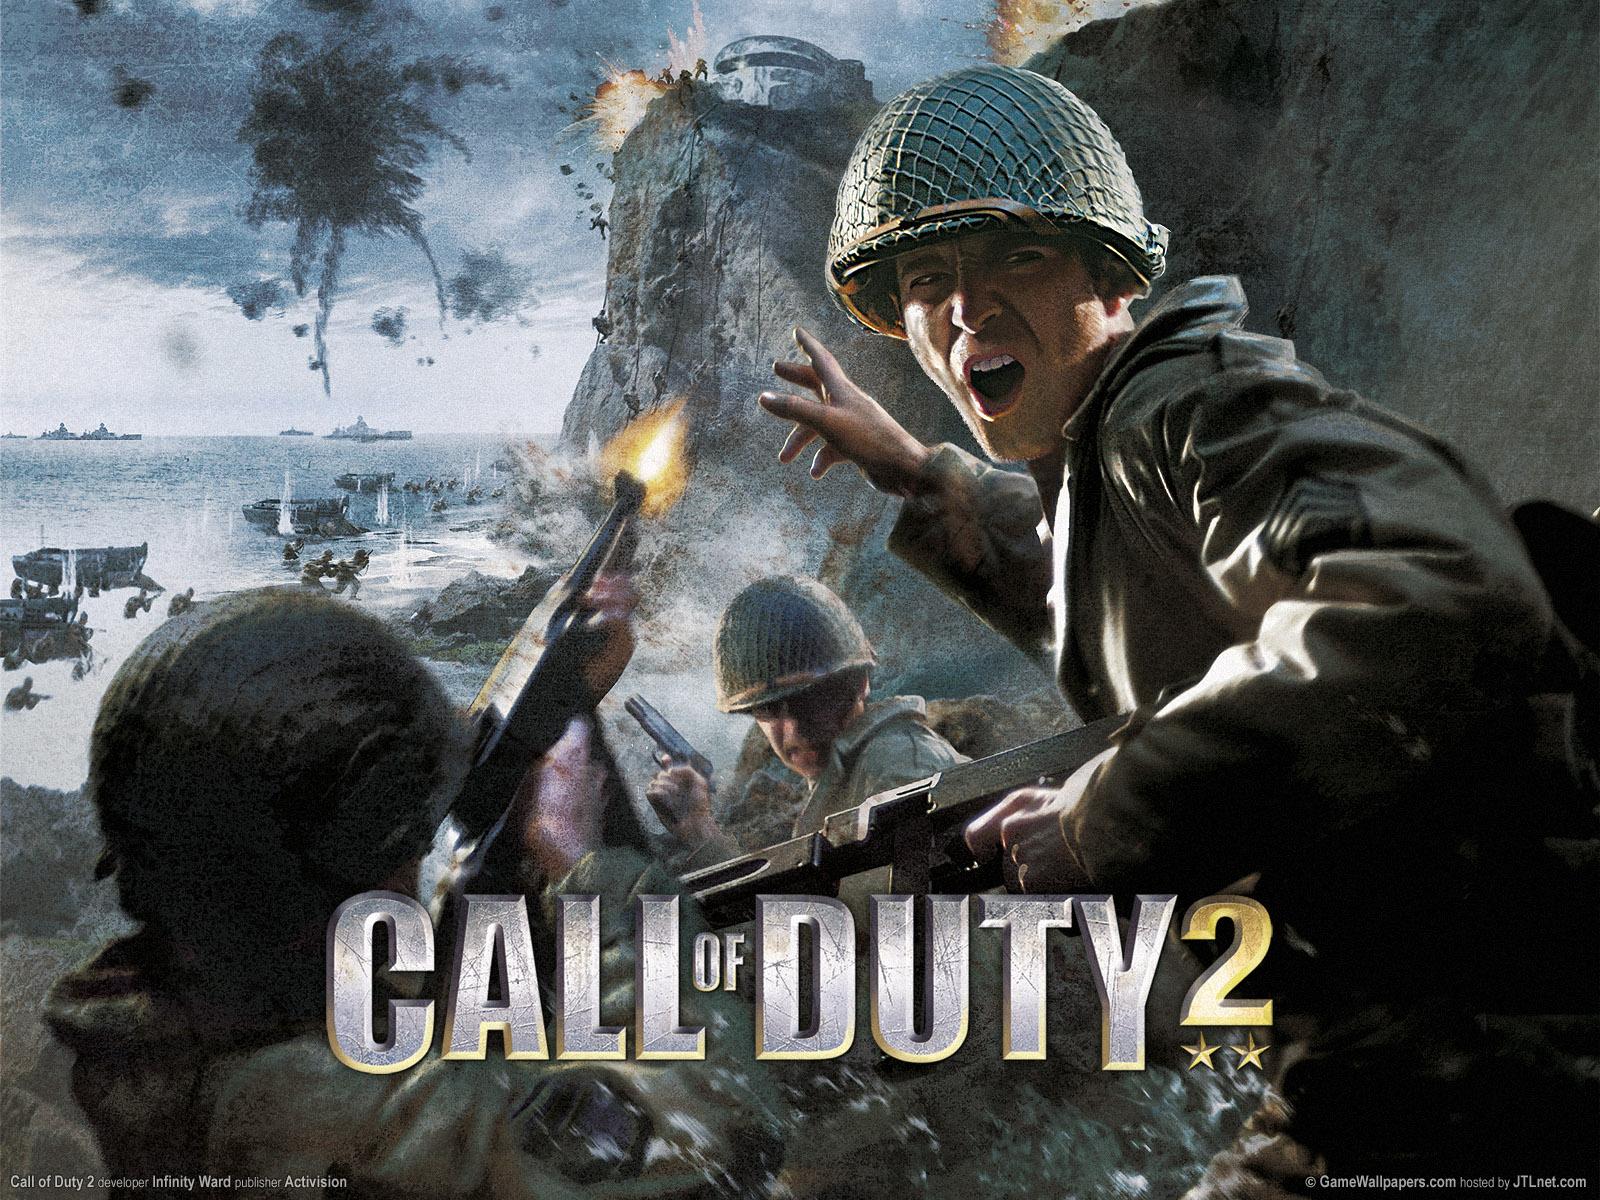 1600x1200 Call of Duty 2 desktop PC and Mac wallpaper 1600x1200